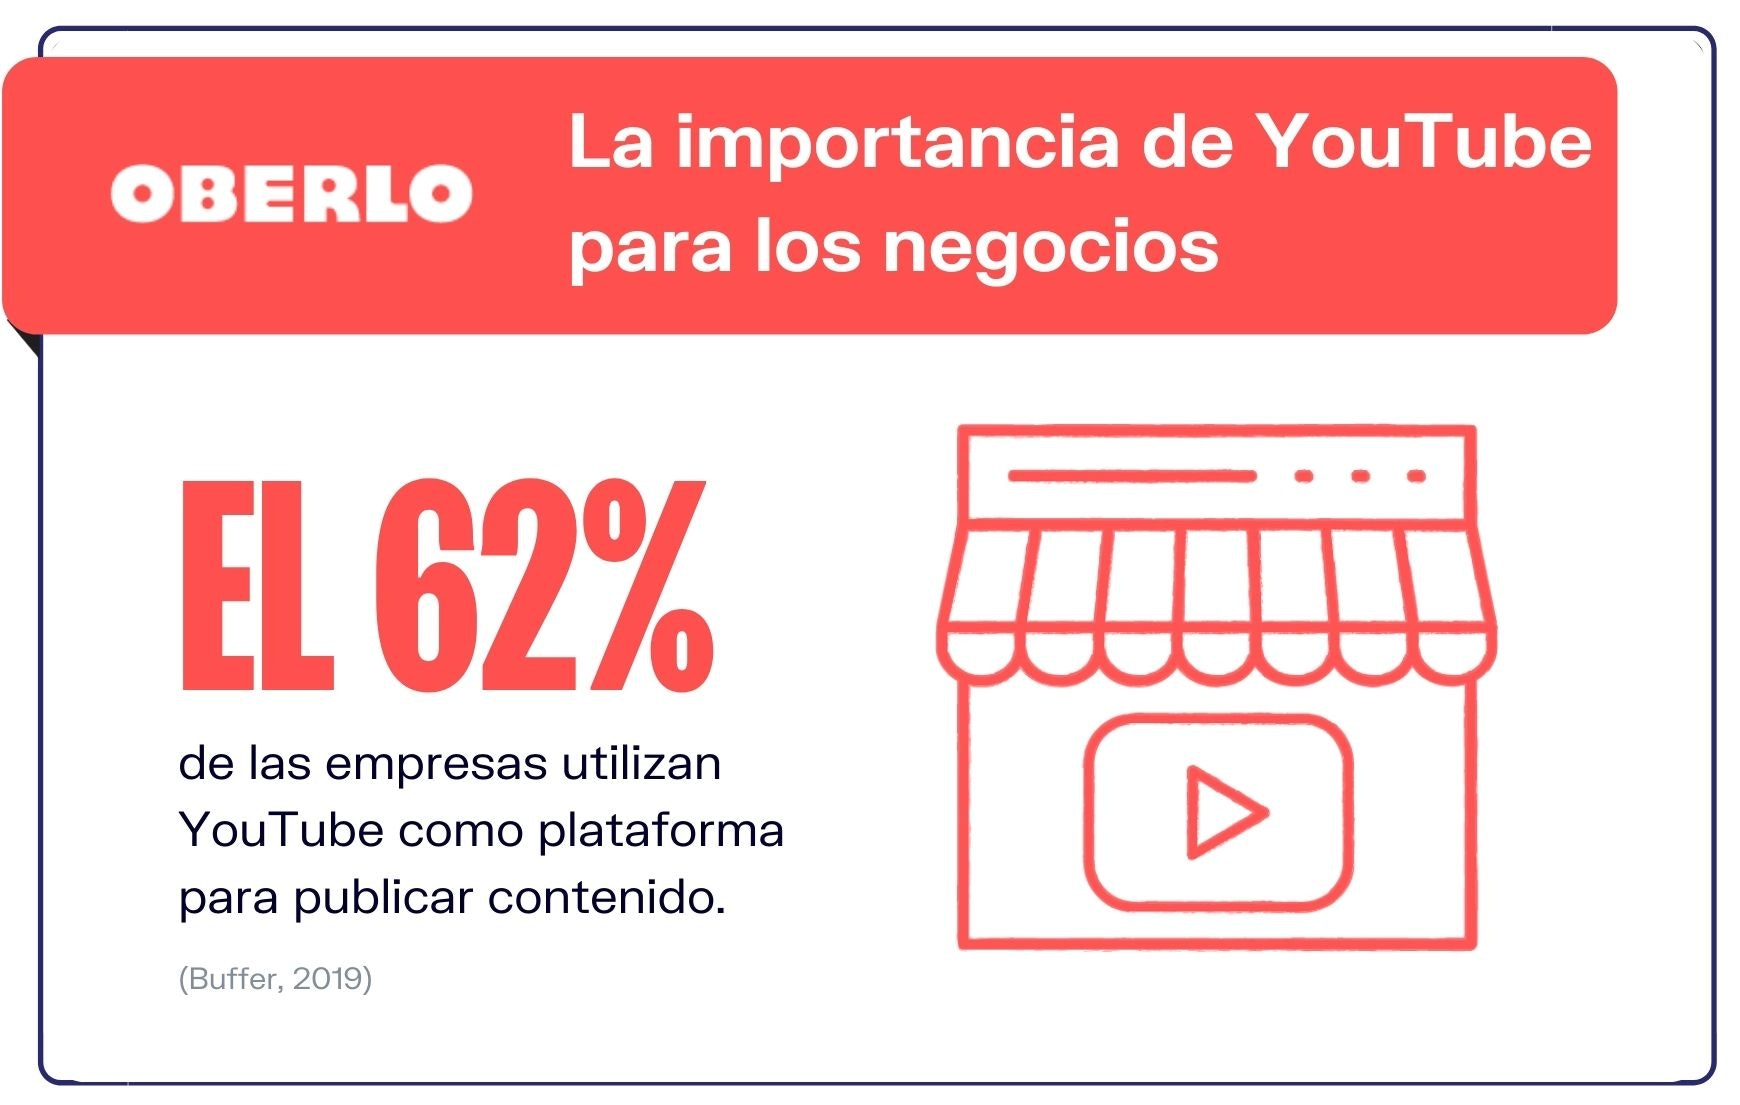 YouTube-Estadisticas-Importancia-YouTube-para-empresas